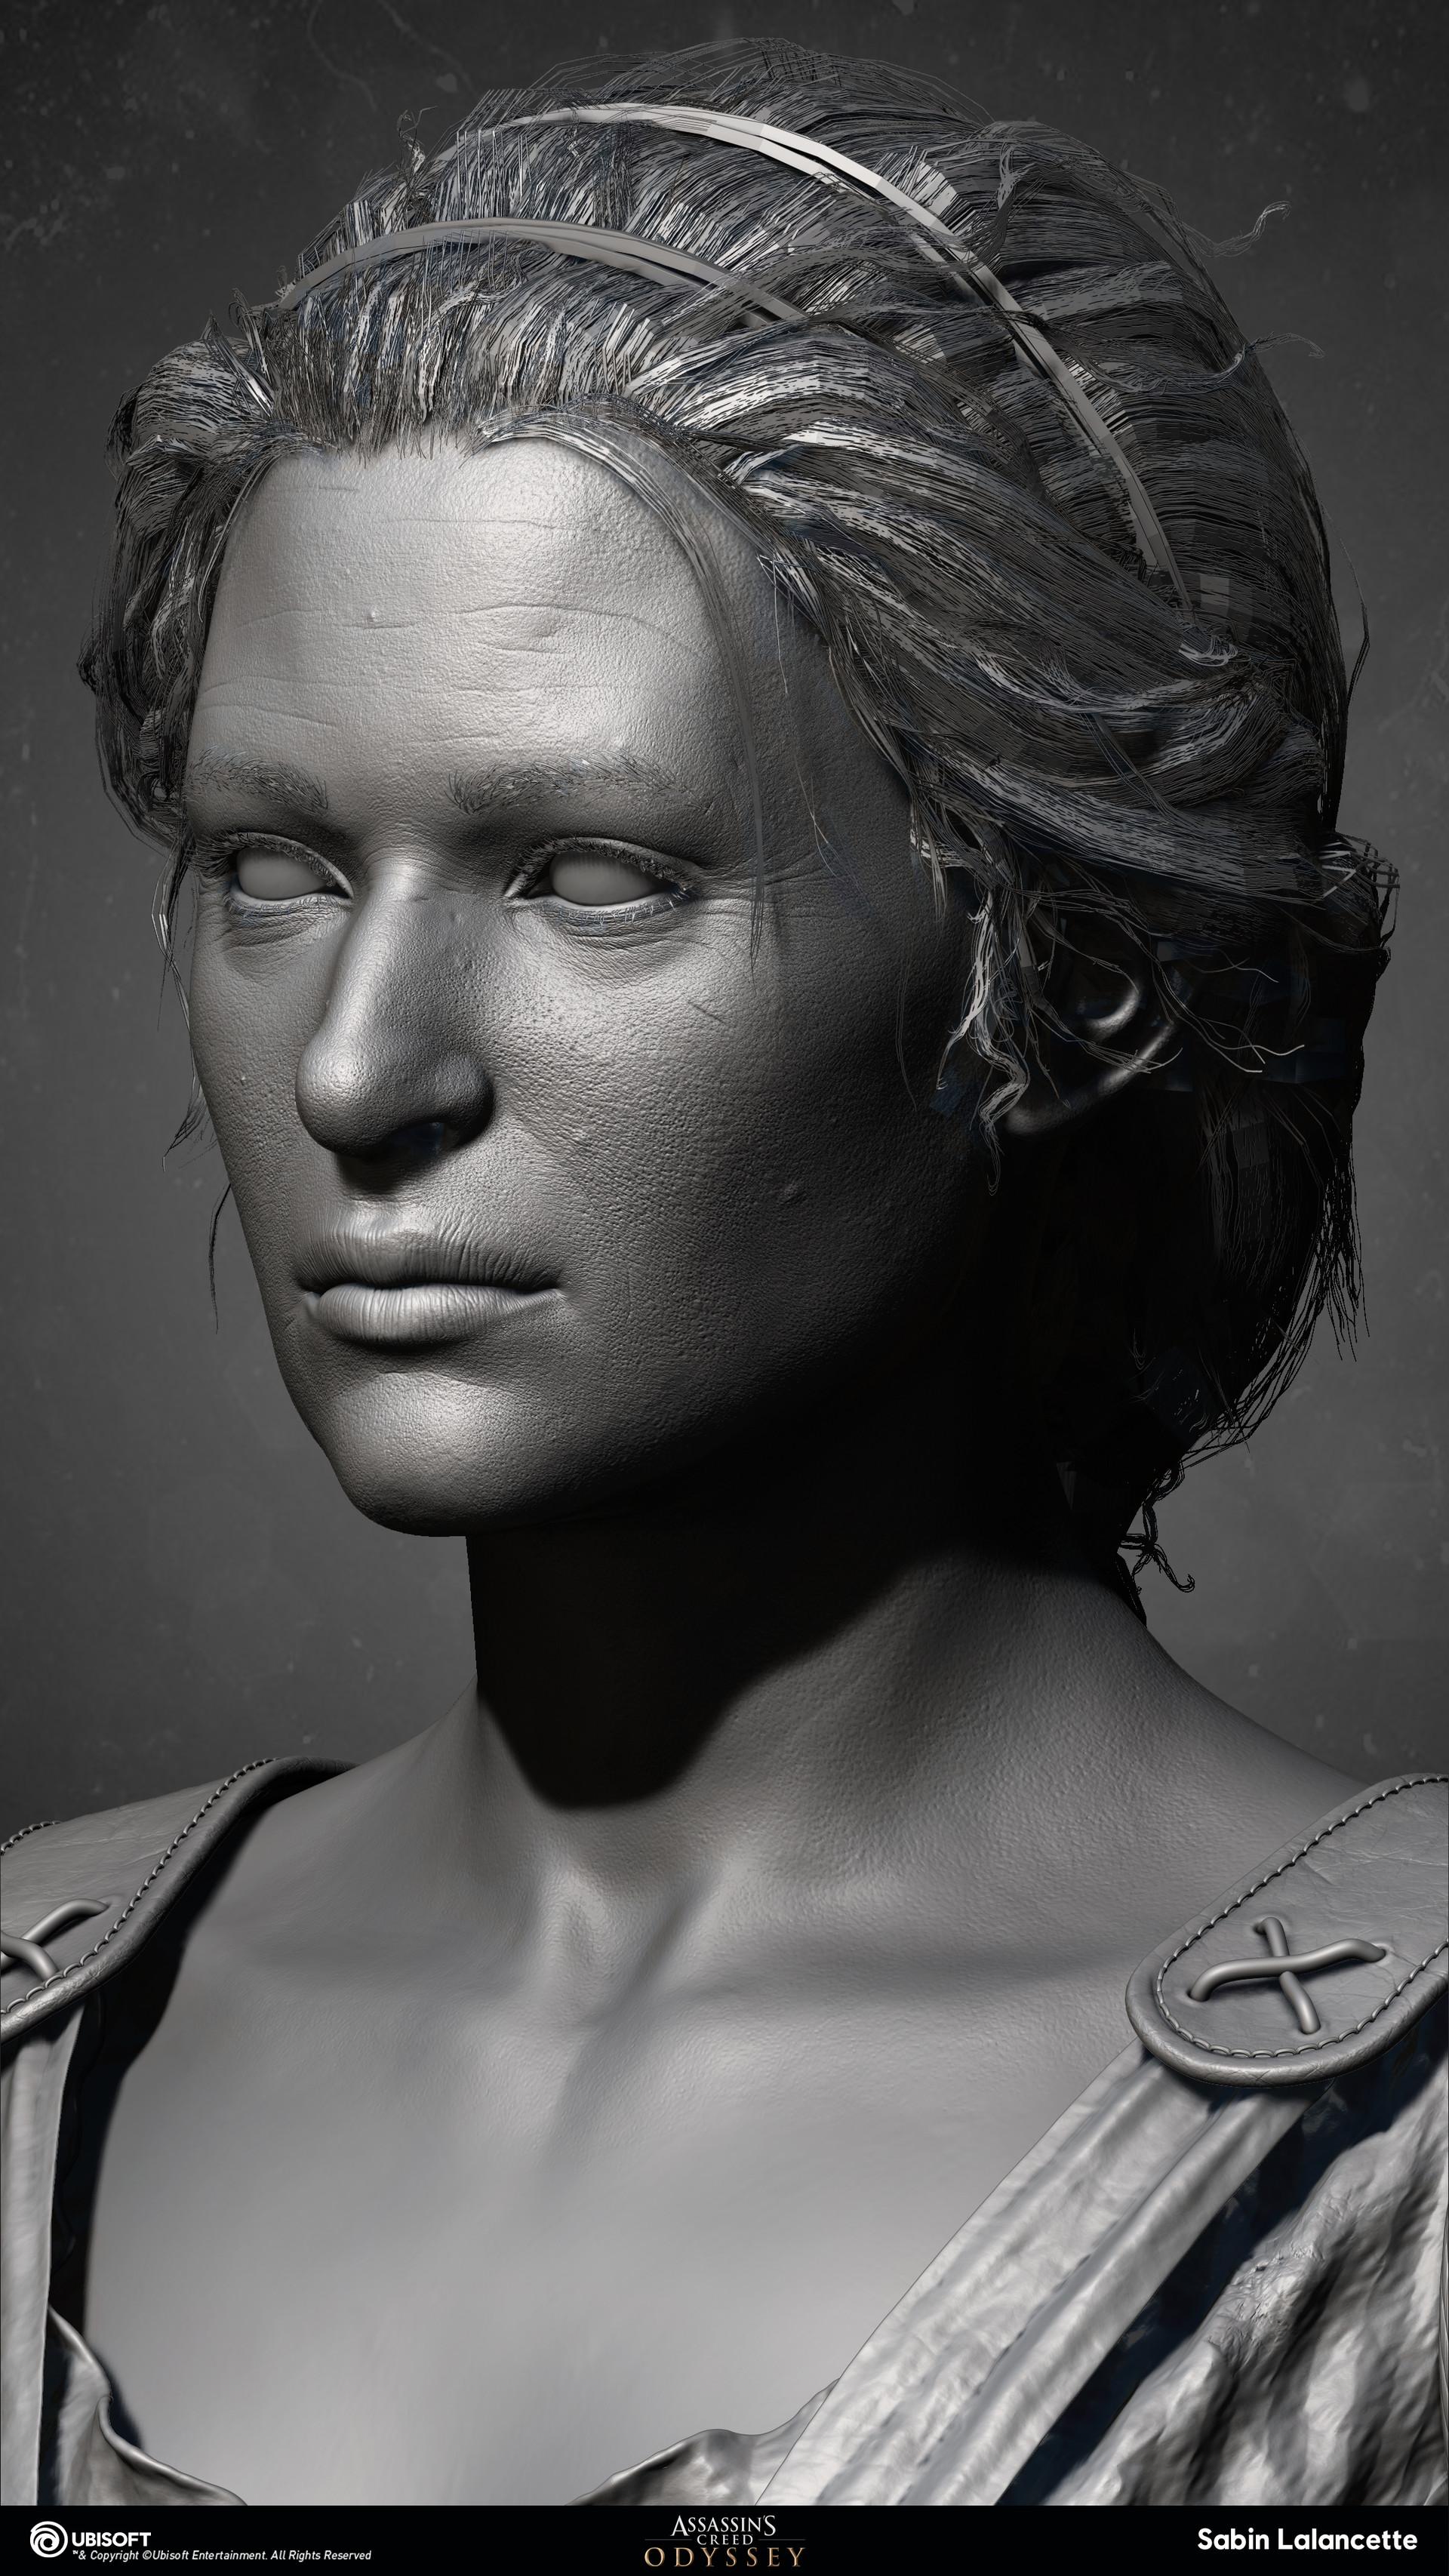 sabin-lalancette-artblast-fullsizezb-hex-portrait3quarter-myrinneold-slalancette